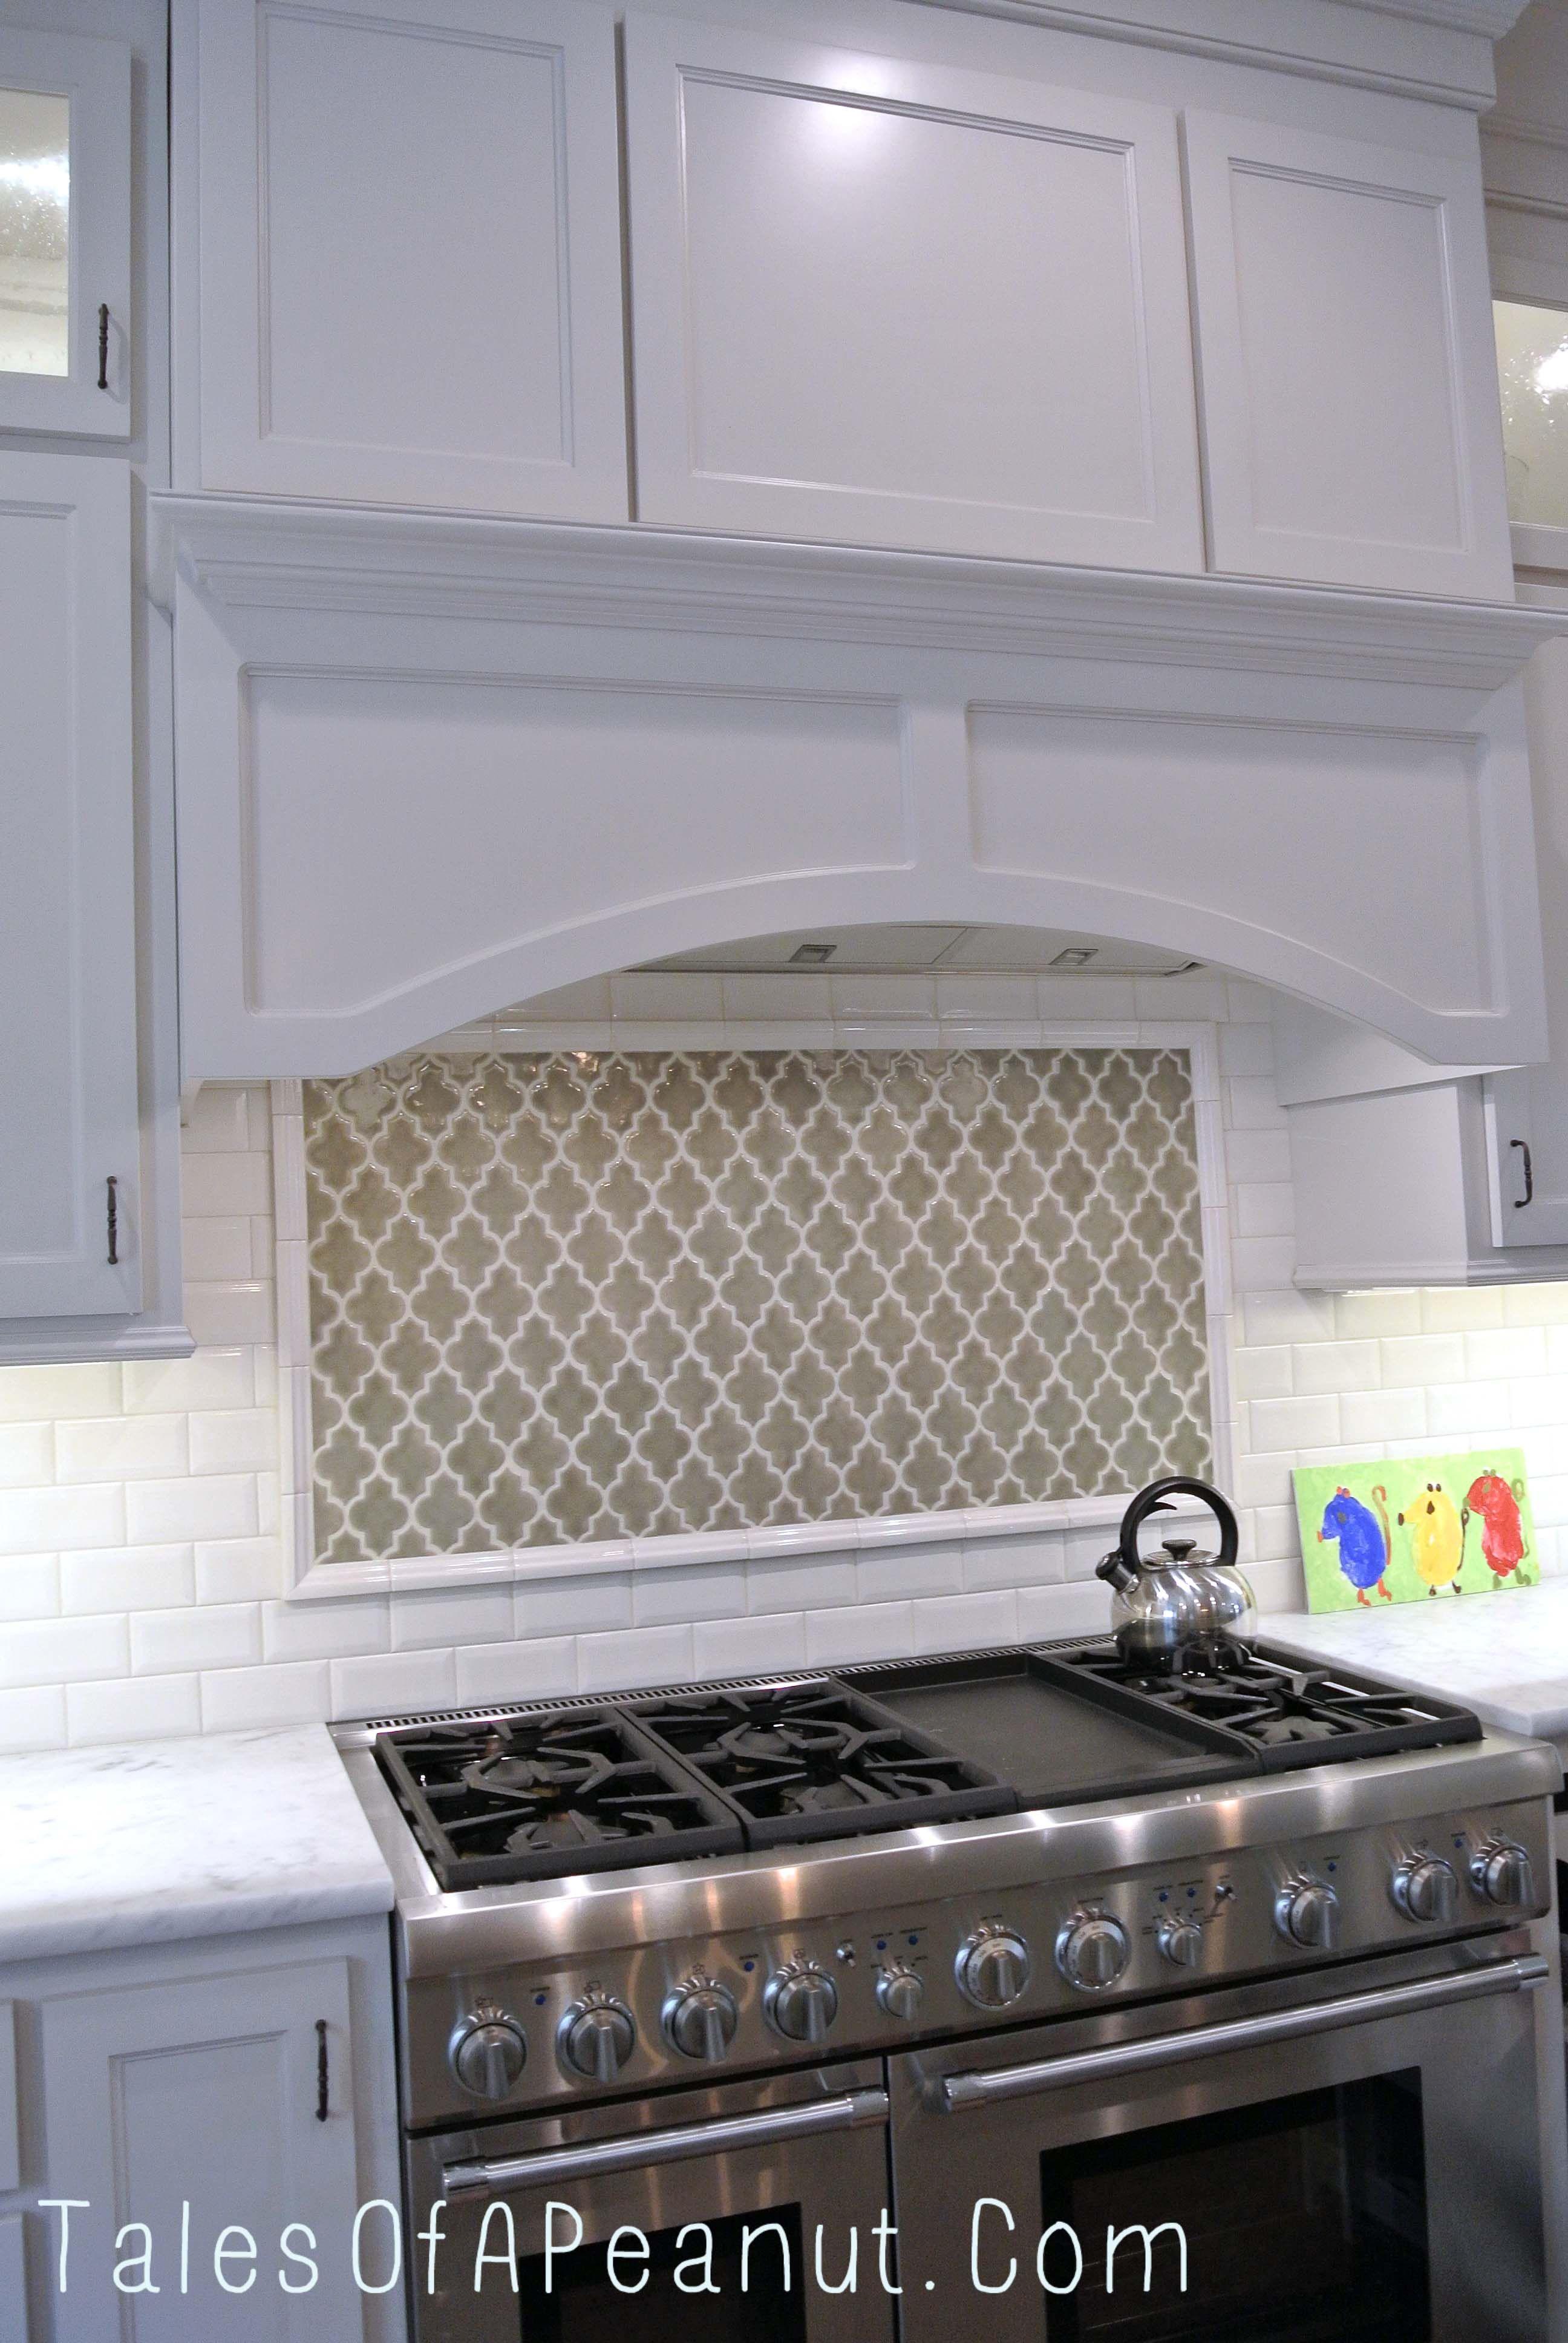 Glass tile trim google search kitchen pinterest tile trim kitchen range and hood and walker zanger backsplash jenn elwell doublecrazyfo Image collections